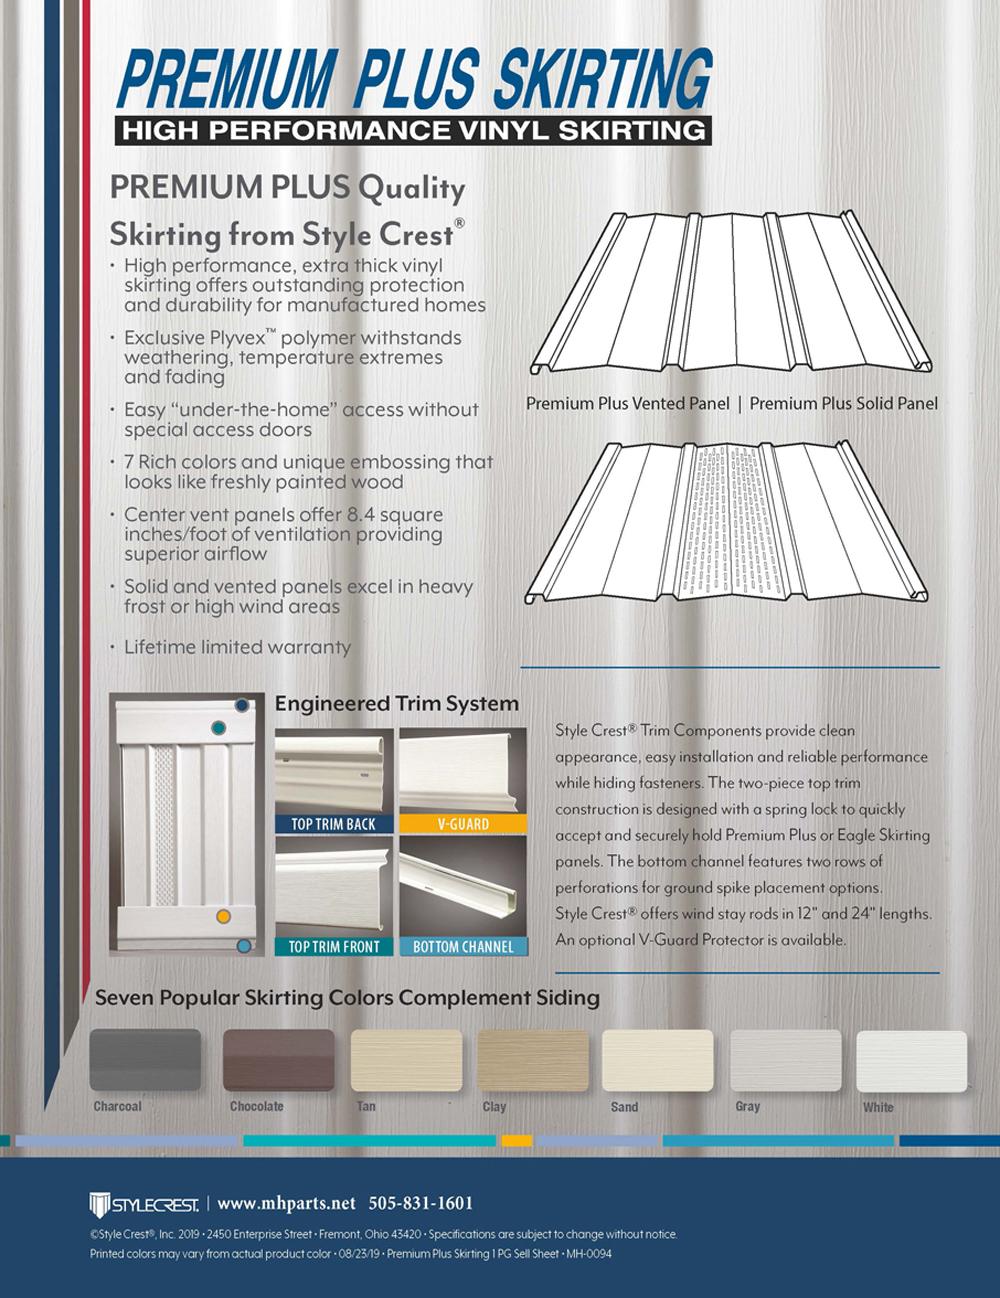 Premium Plus Vinyl Skirting info